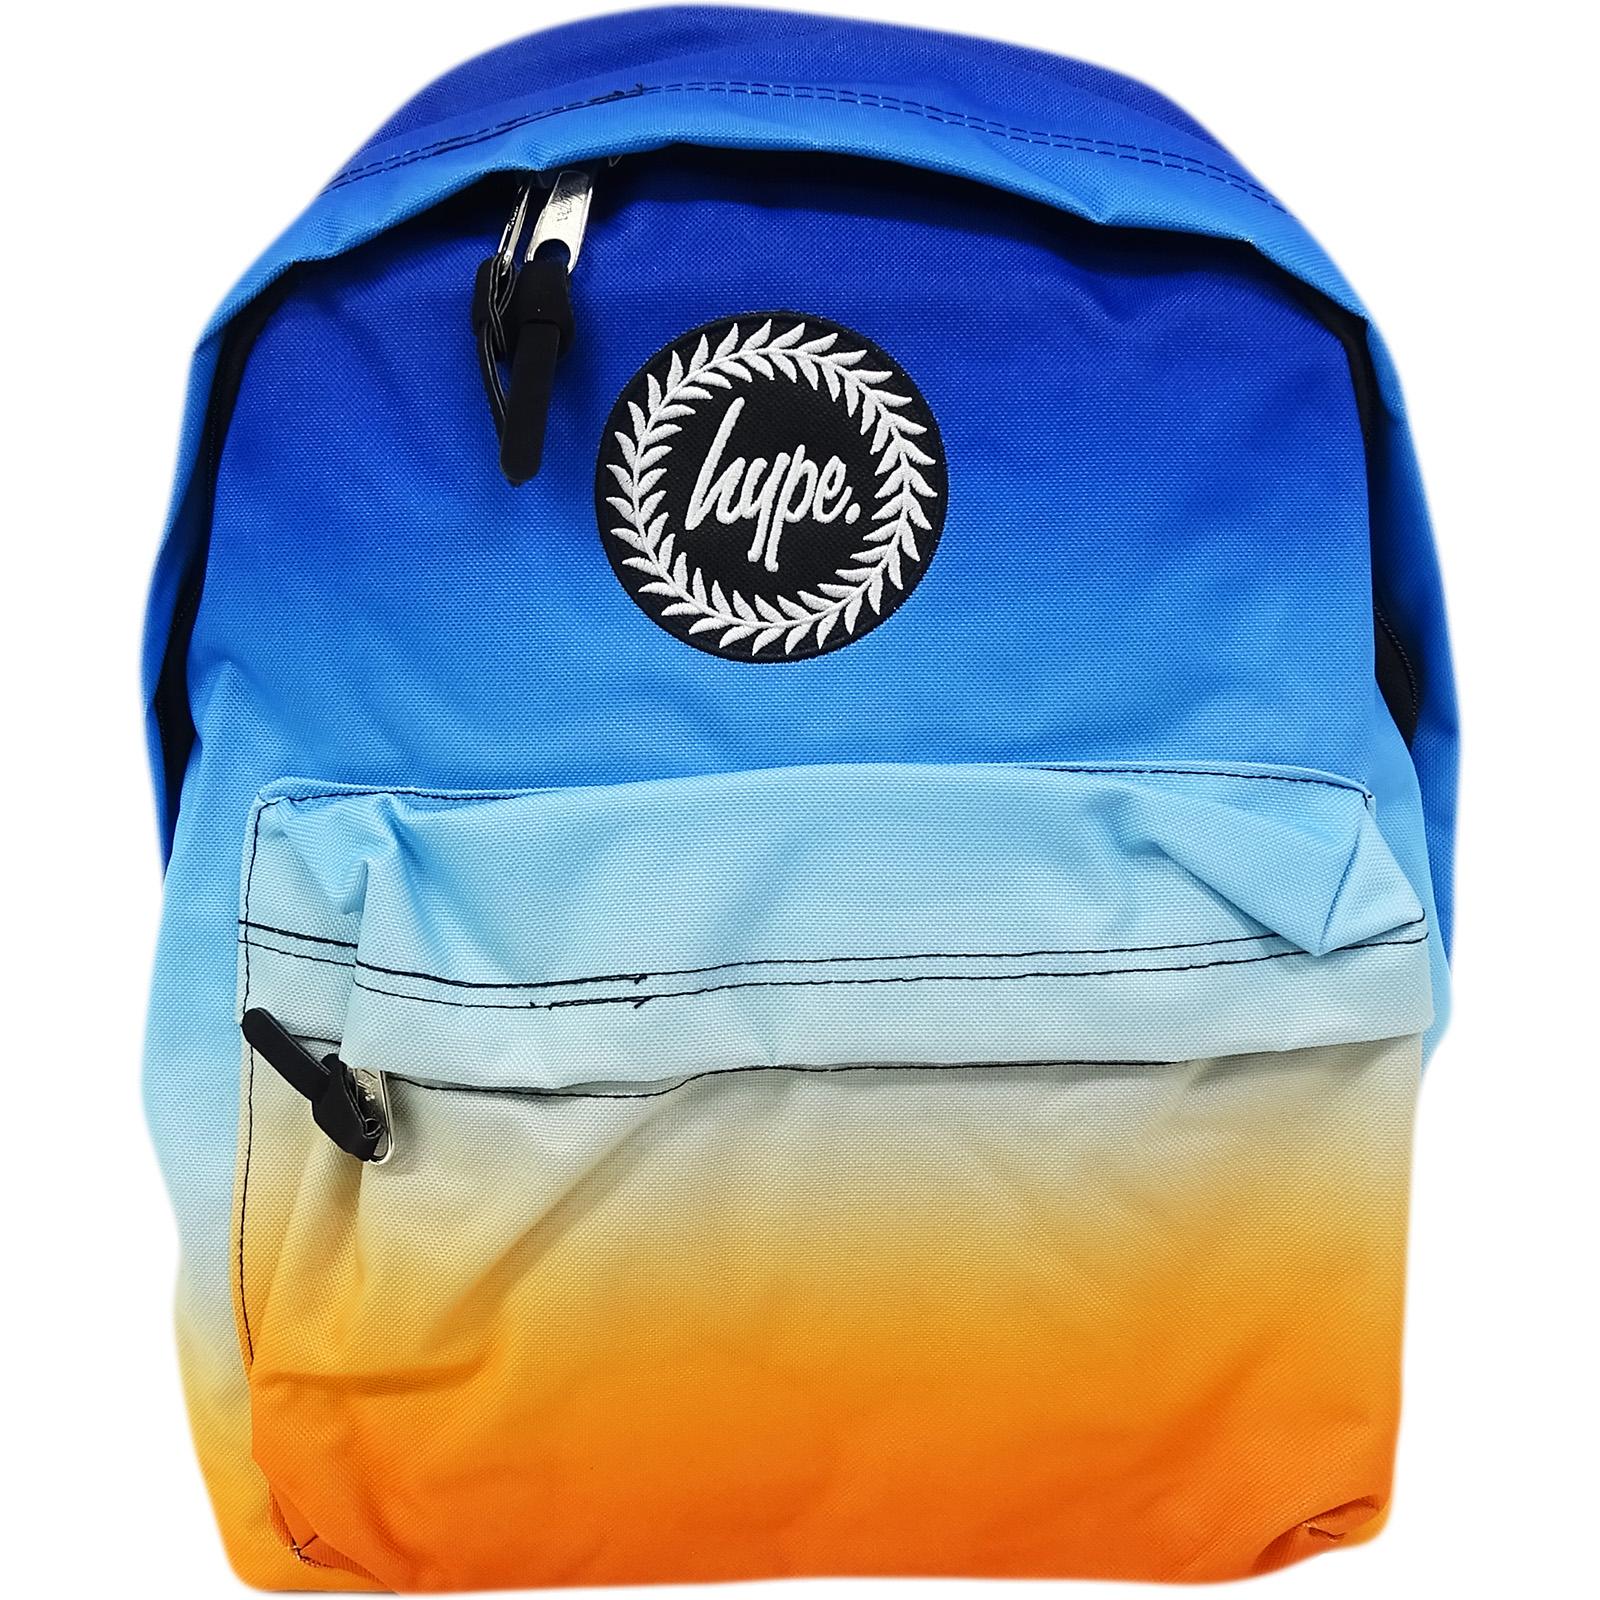 Hype Rucksack Blue / Orange Gradient Fade Bag Ocean Haze